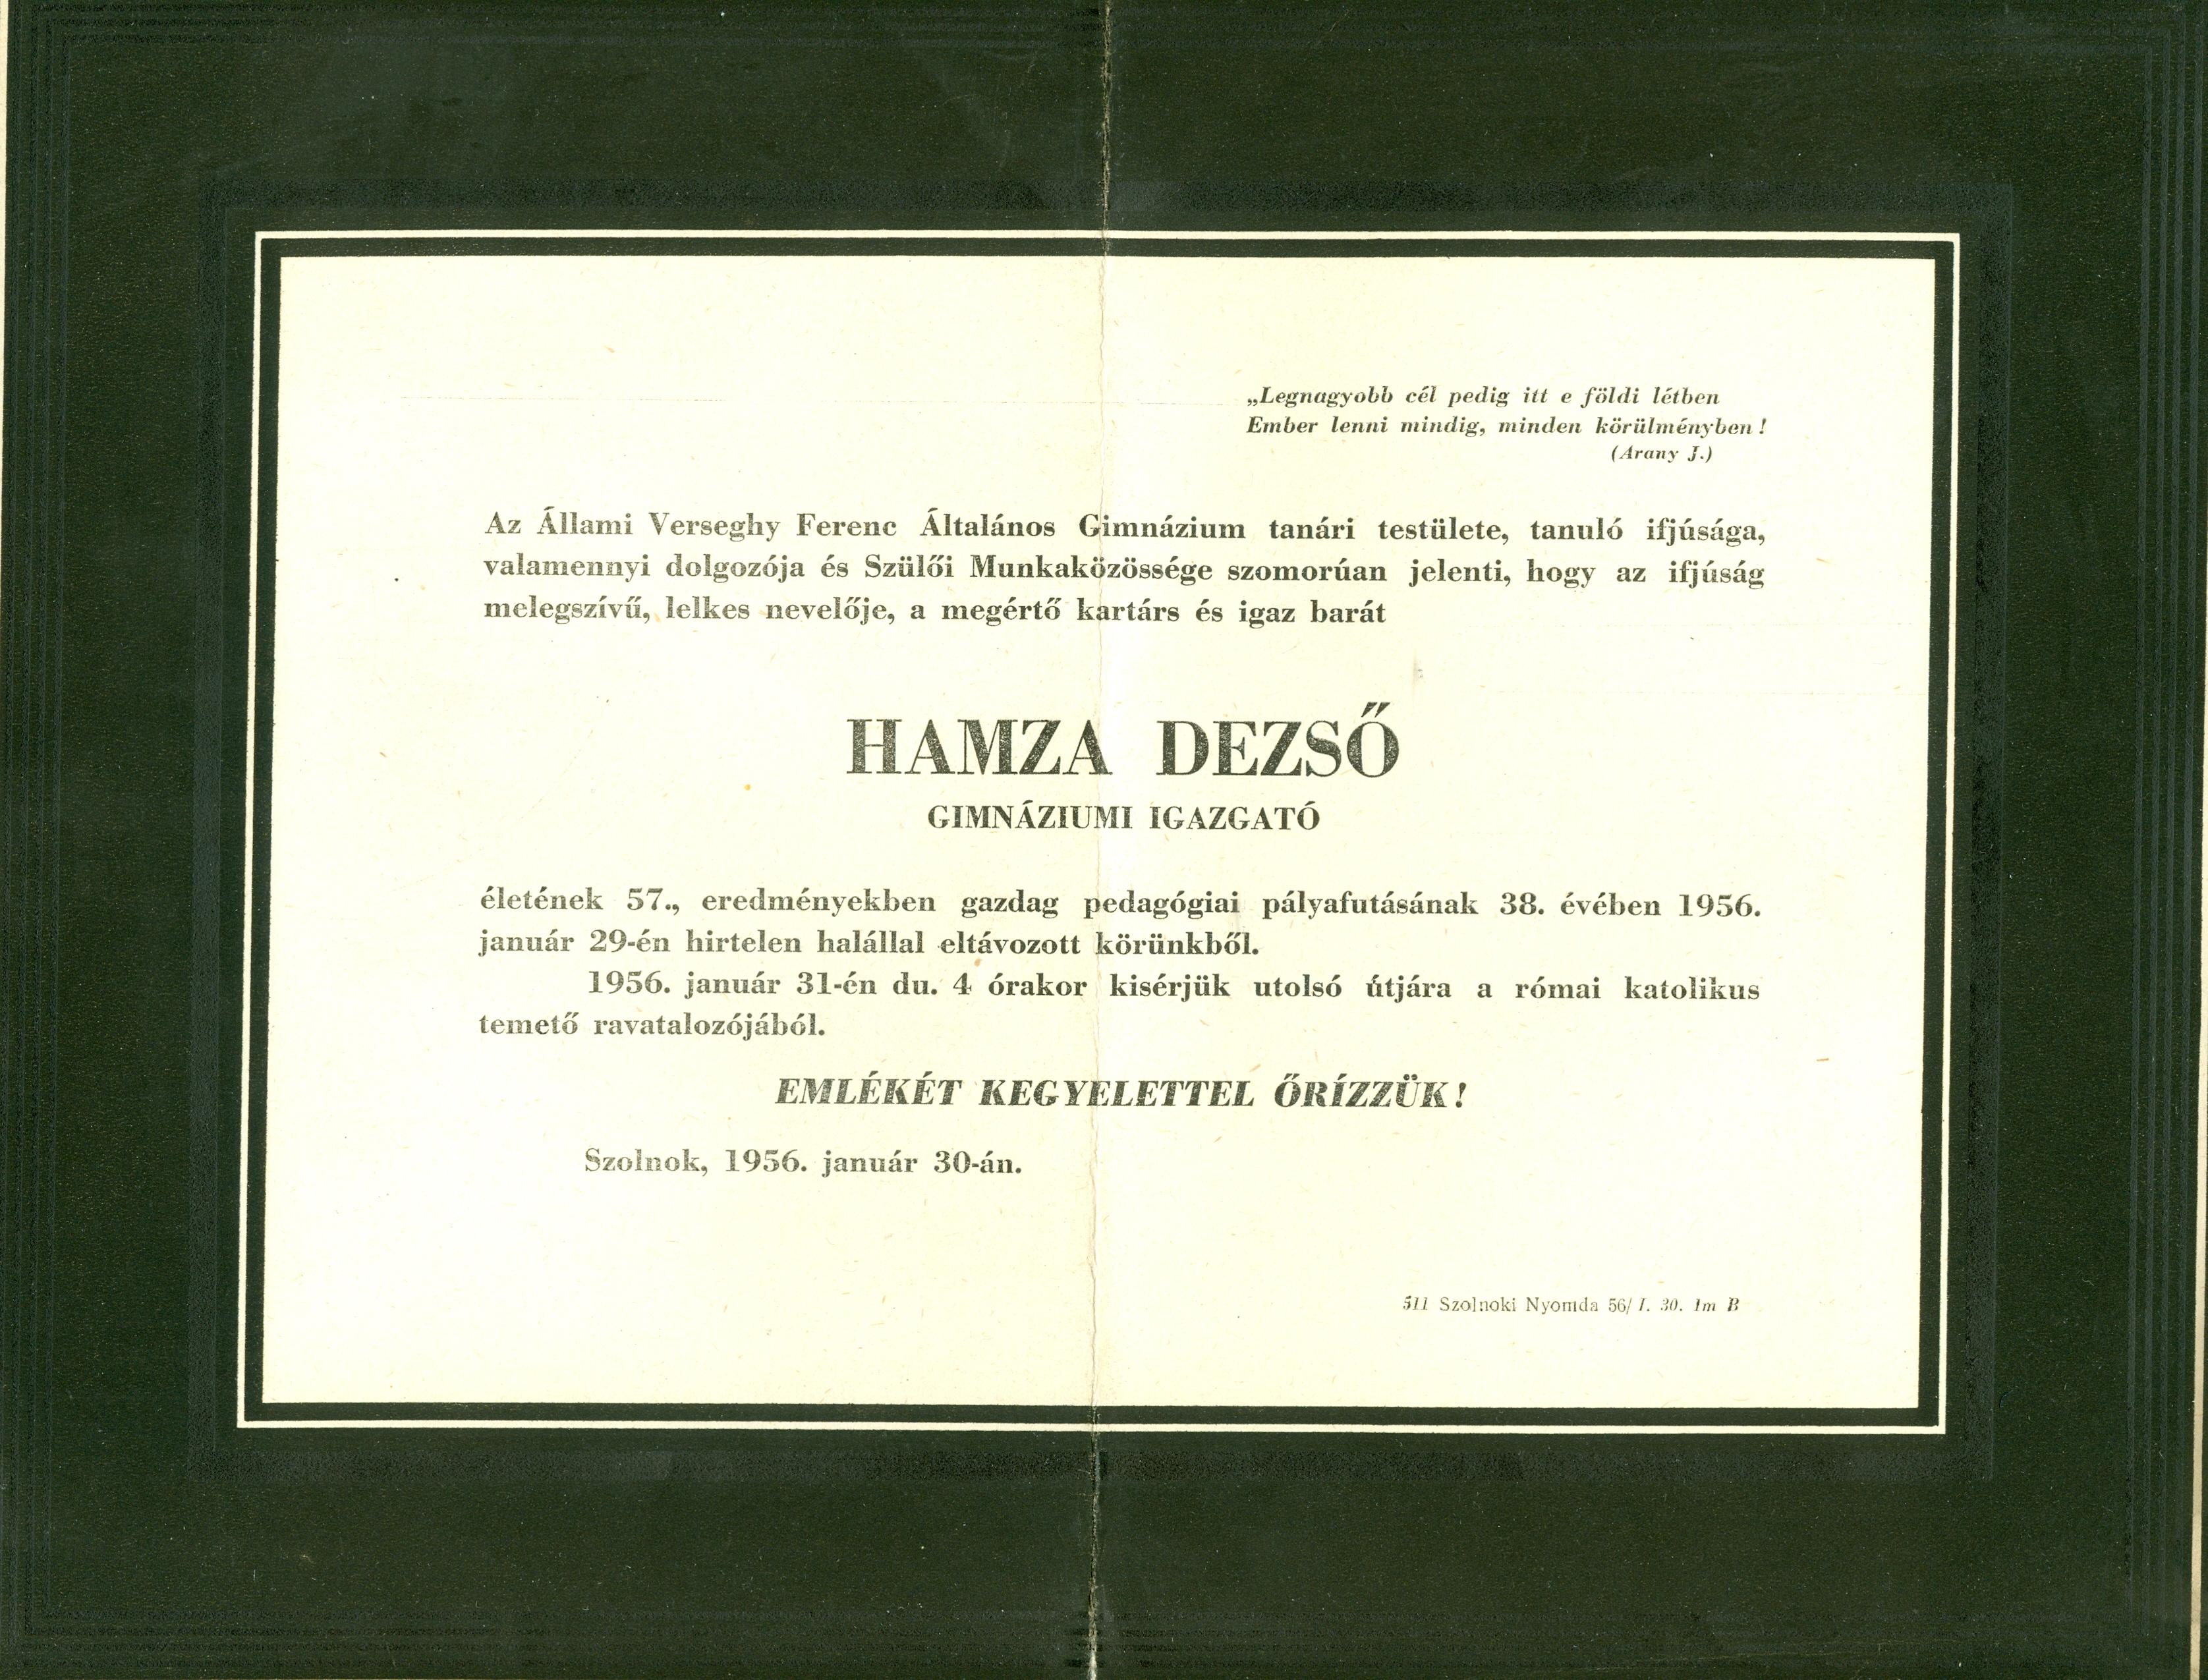 Hamza Dezső